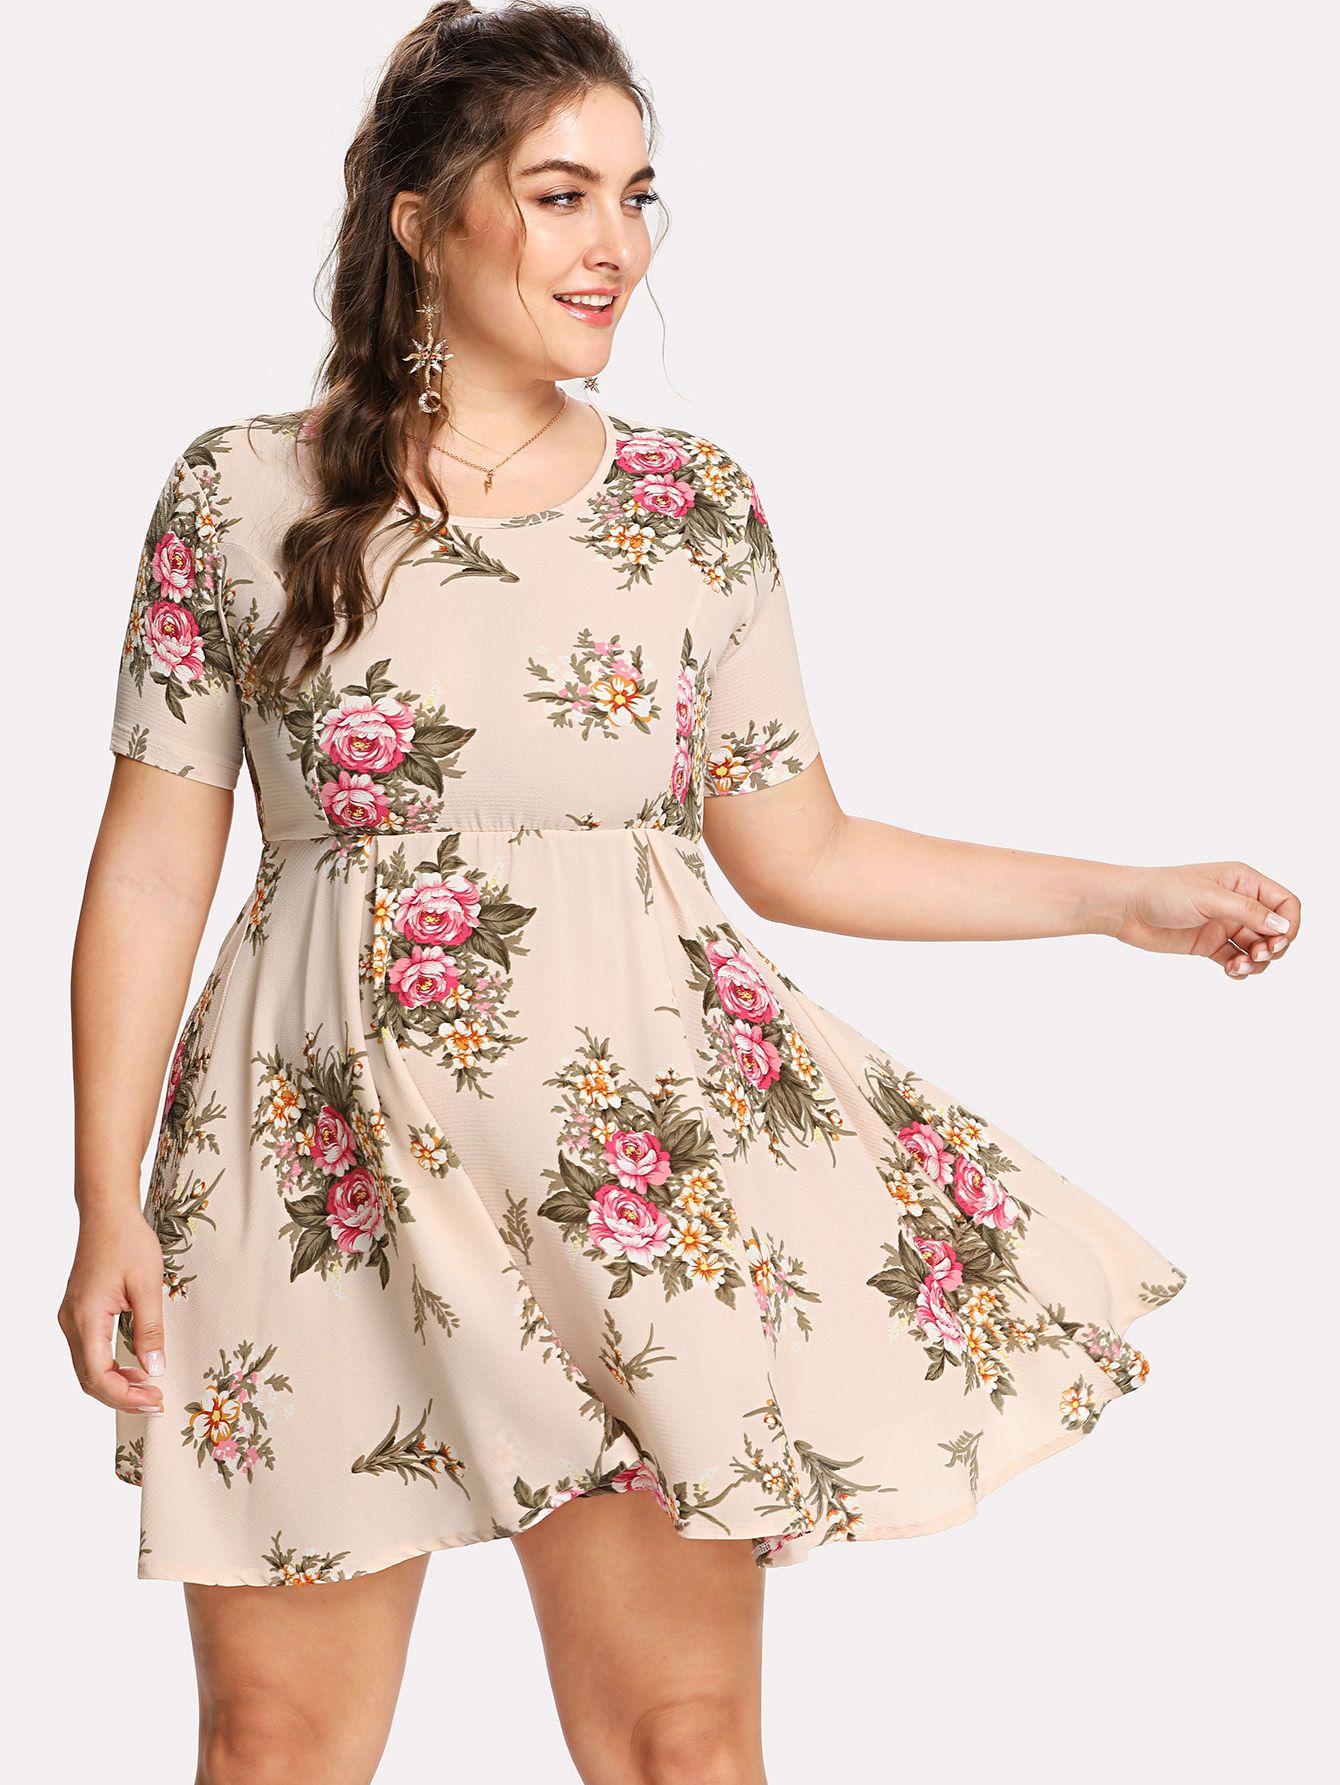 Plus Flower Print Fit Flare Dress Fit Flare Dress Short Sleeve Dresses Dresses [ 1785 x 1340 Pixel ]